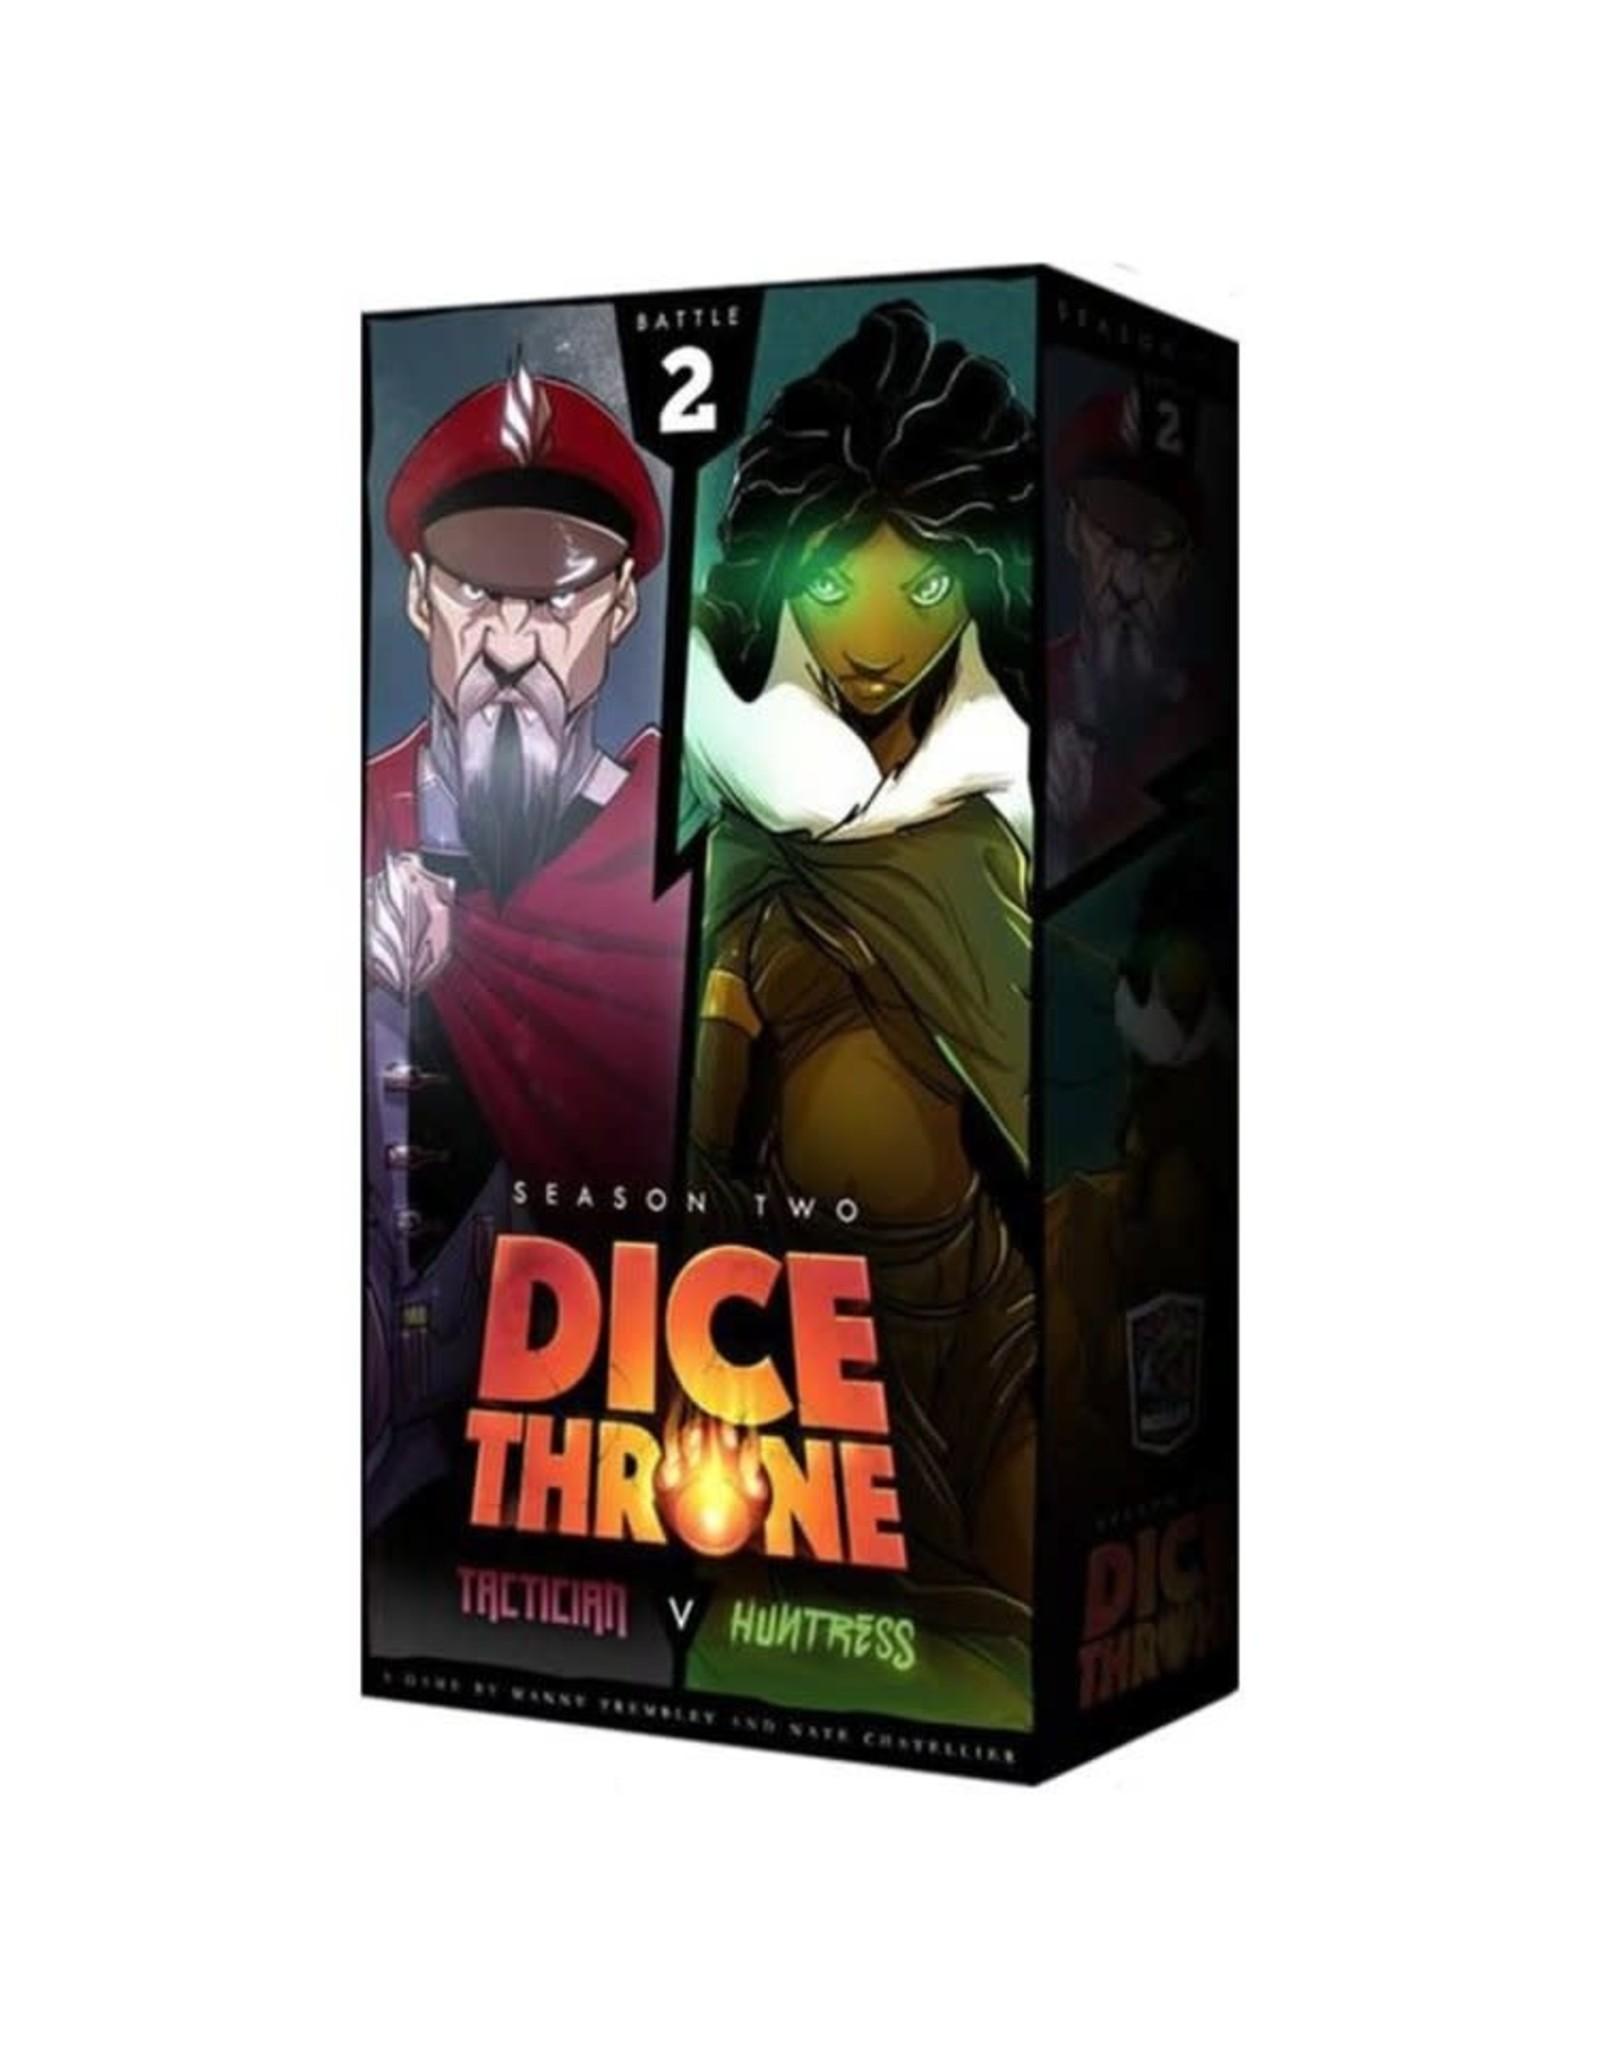 Dice Throne: Season 2 - Tactician vs Huntress